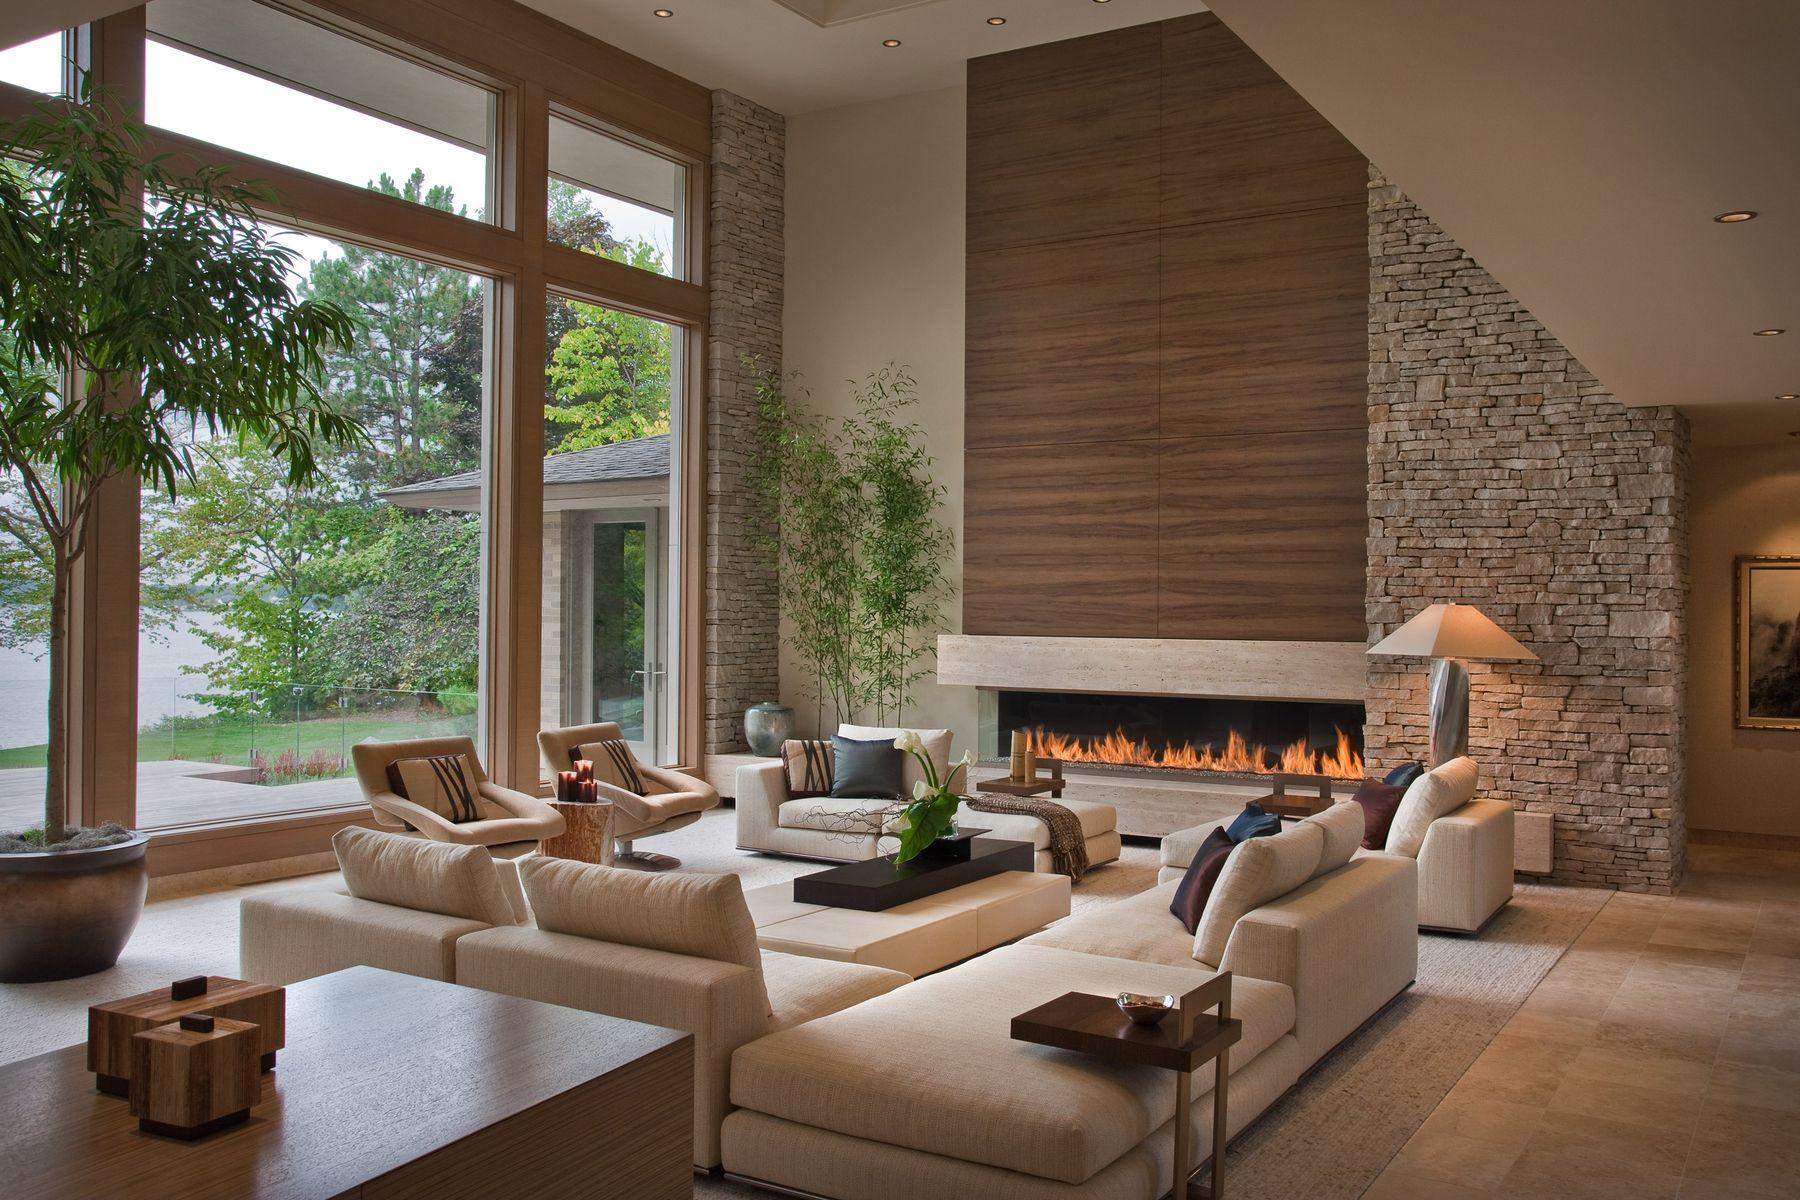 Handmade Living Room 7 by Vogue Furniture | CustomMade.com